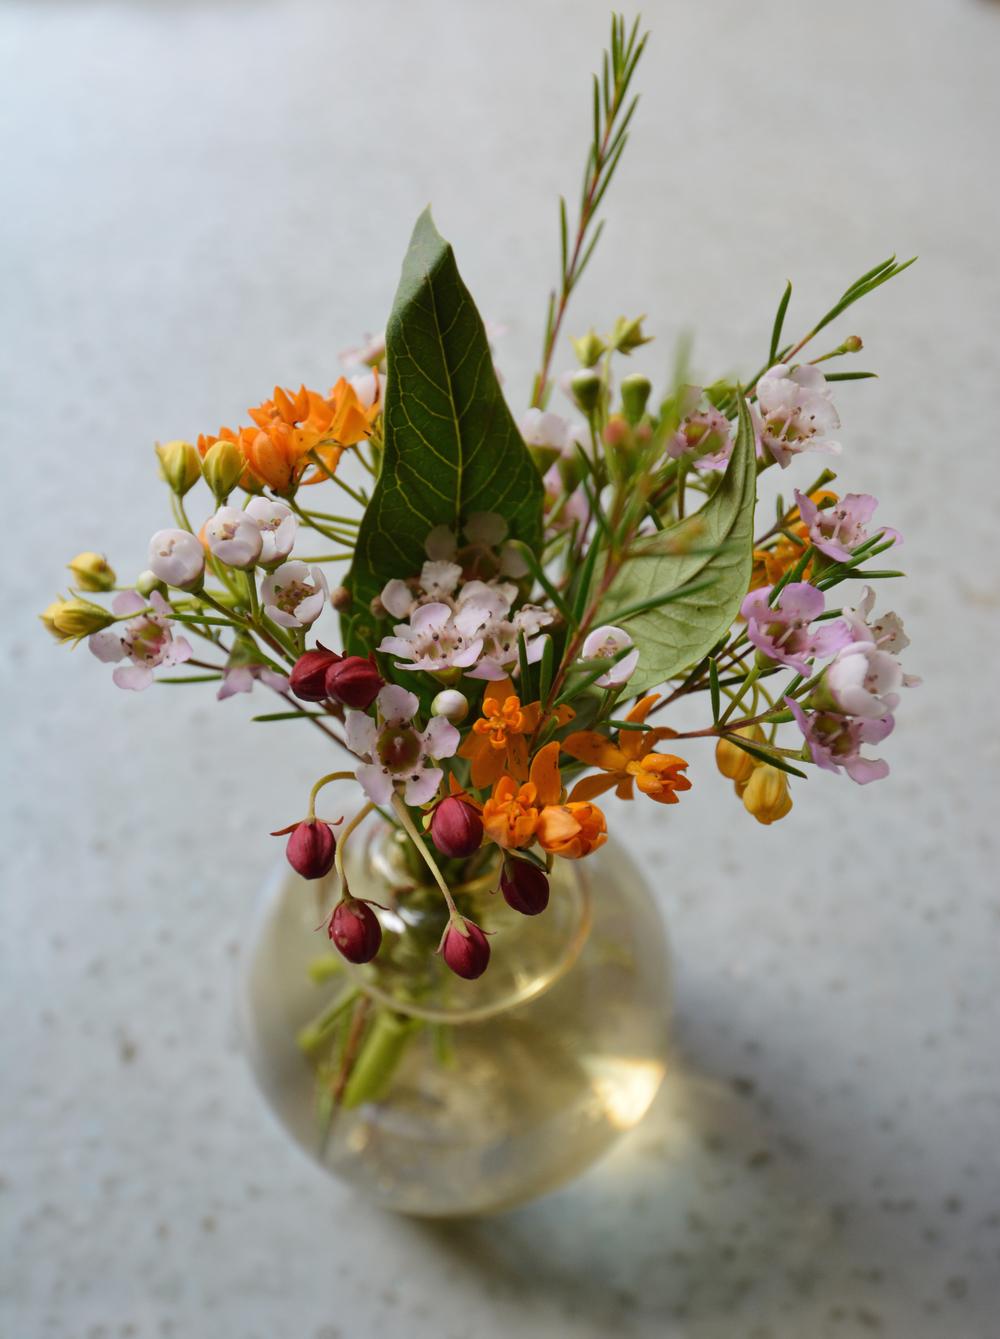 flowerMorten1edit.jpg